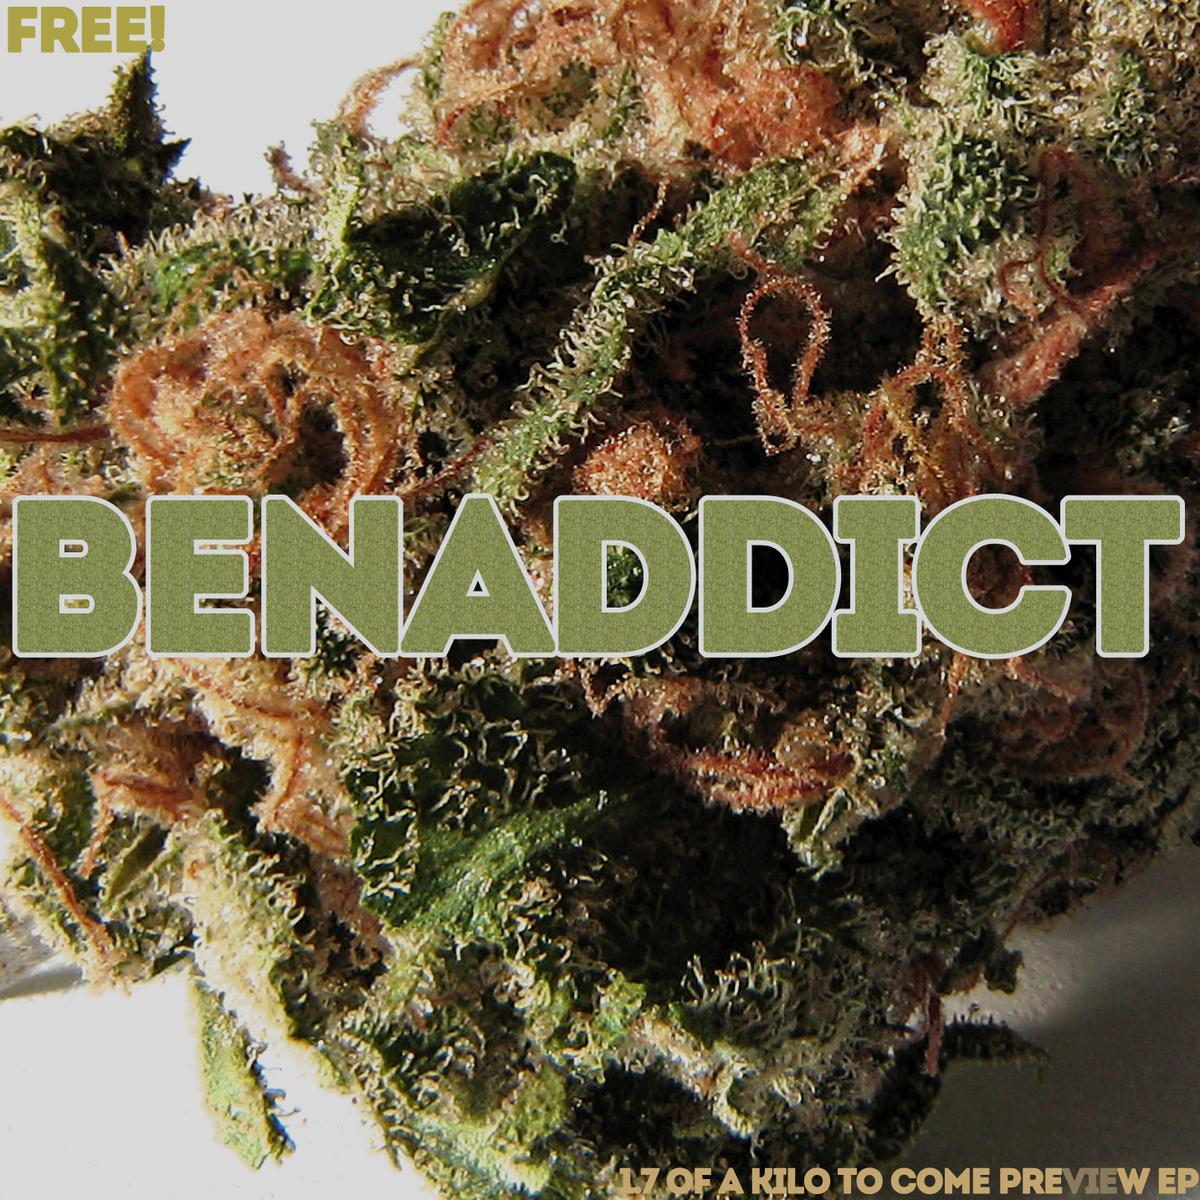 Benaddict - 1.7 Grams Of A Kilo To Come